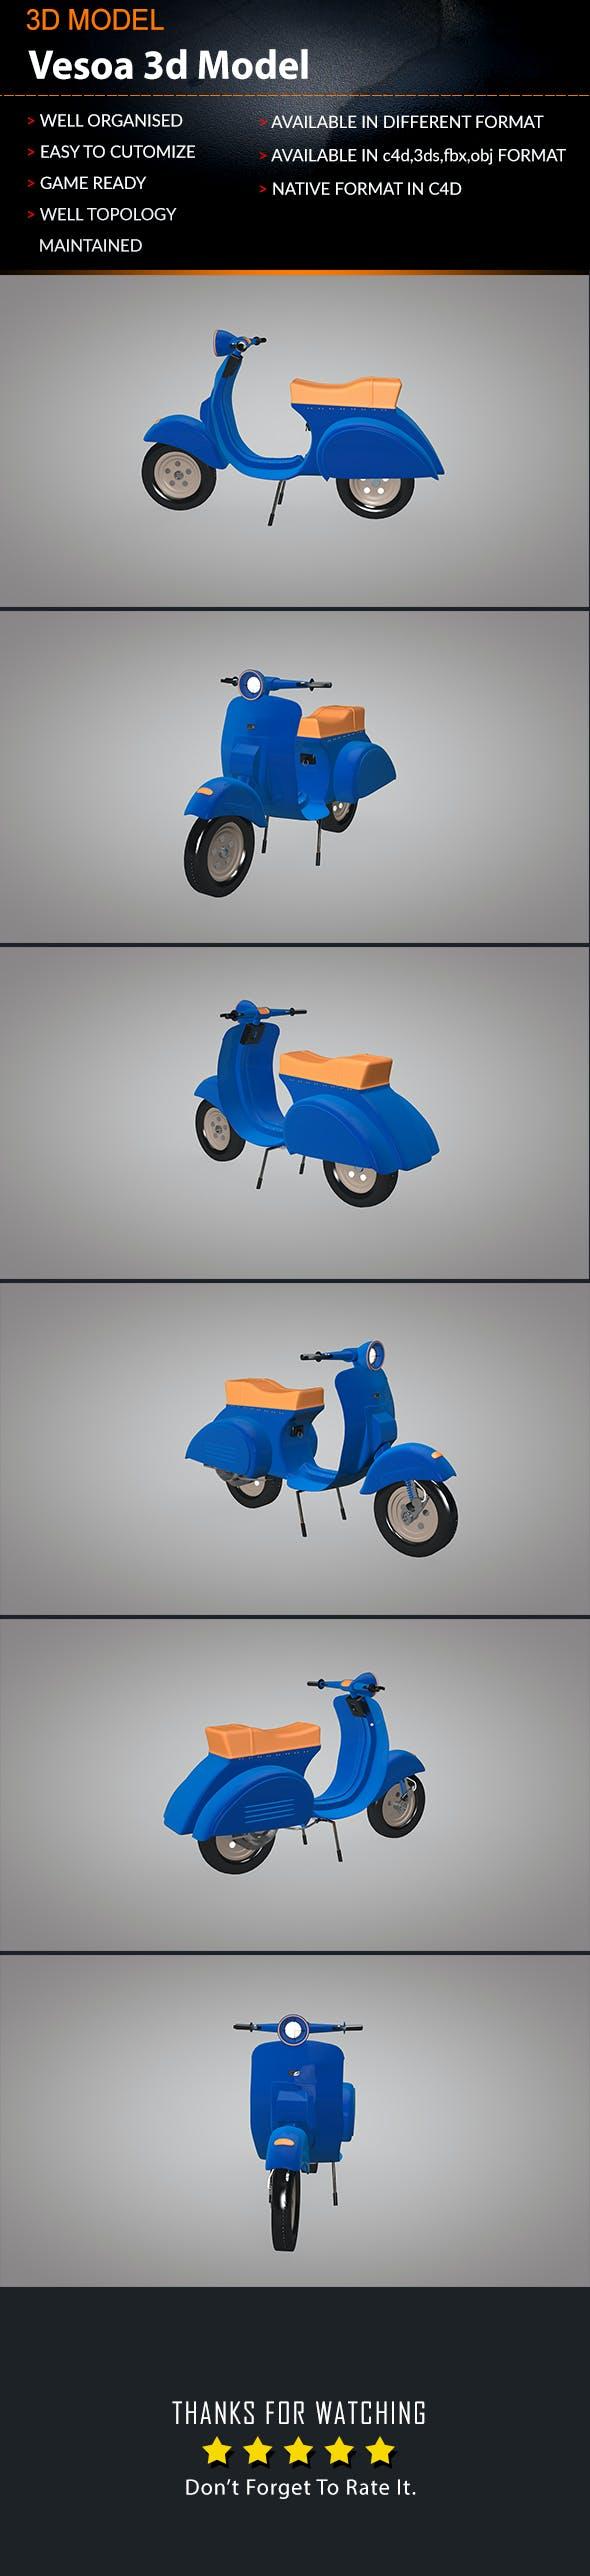 Vespa 3D Model - 3DOcean Item for Sale